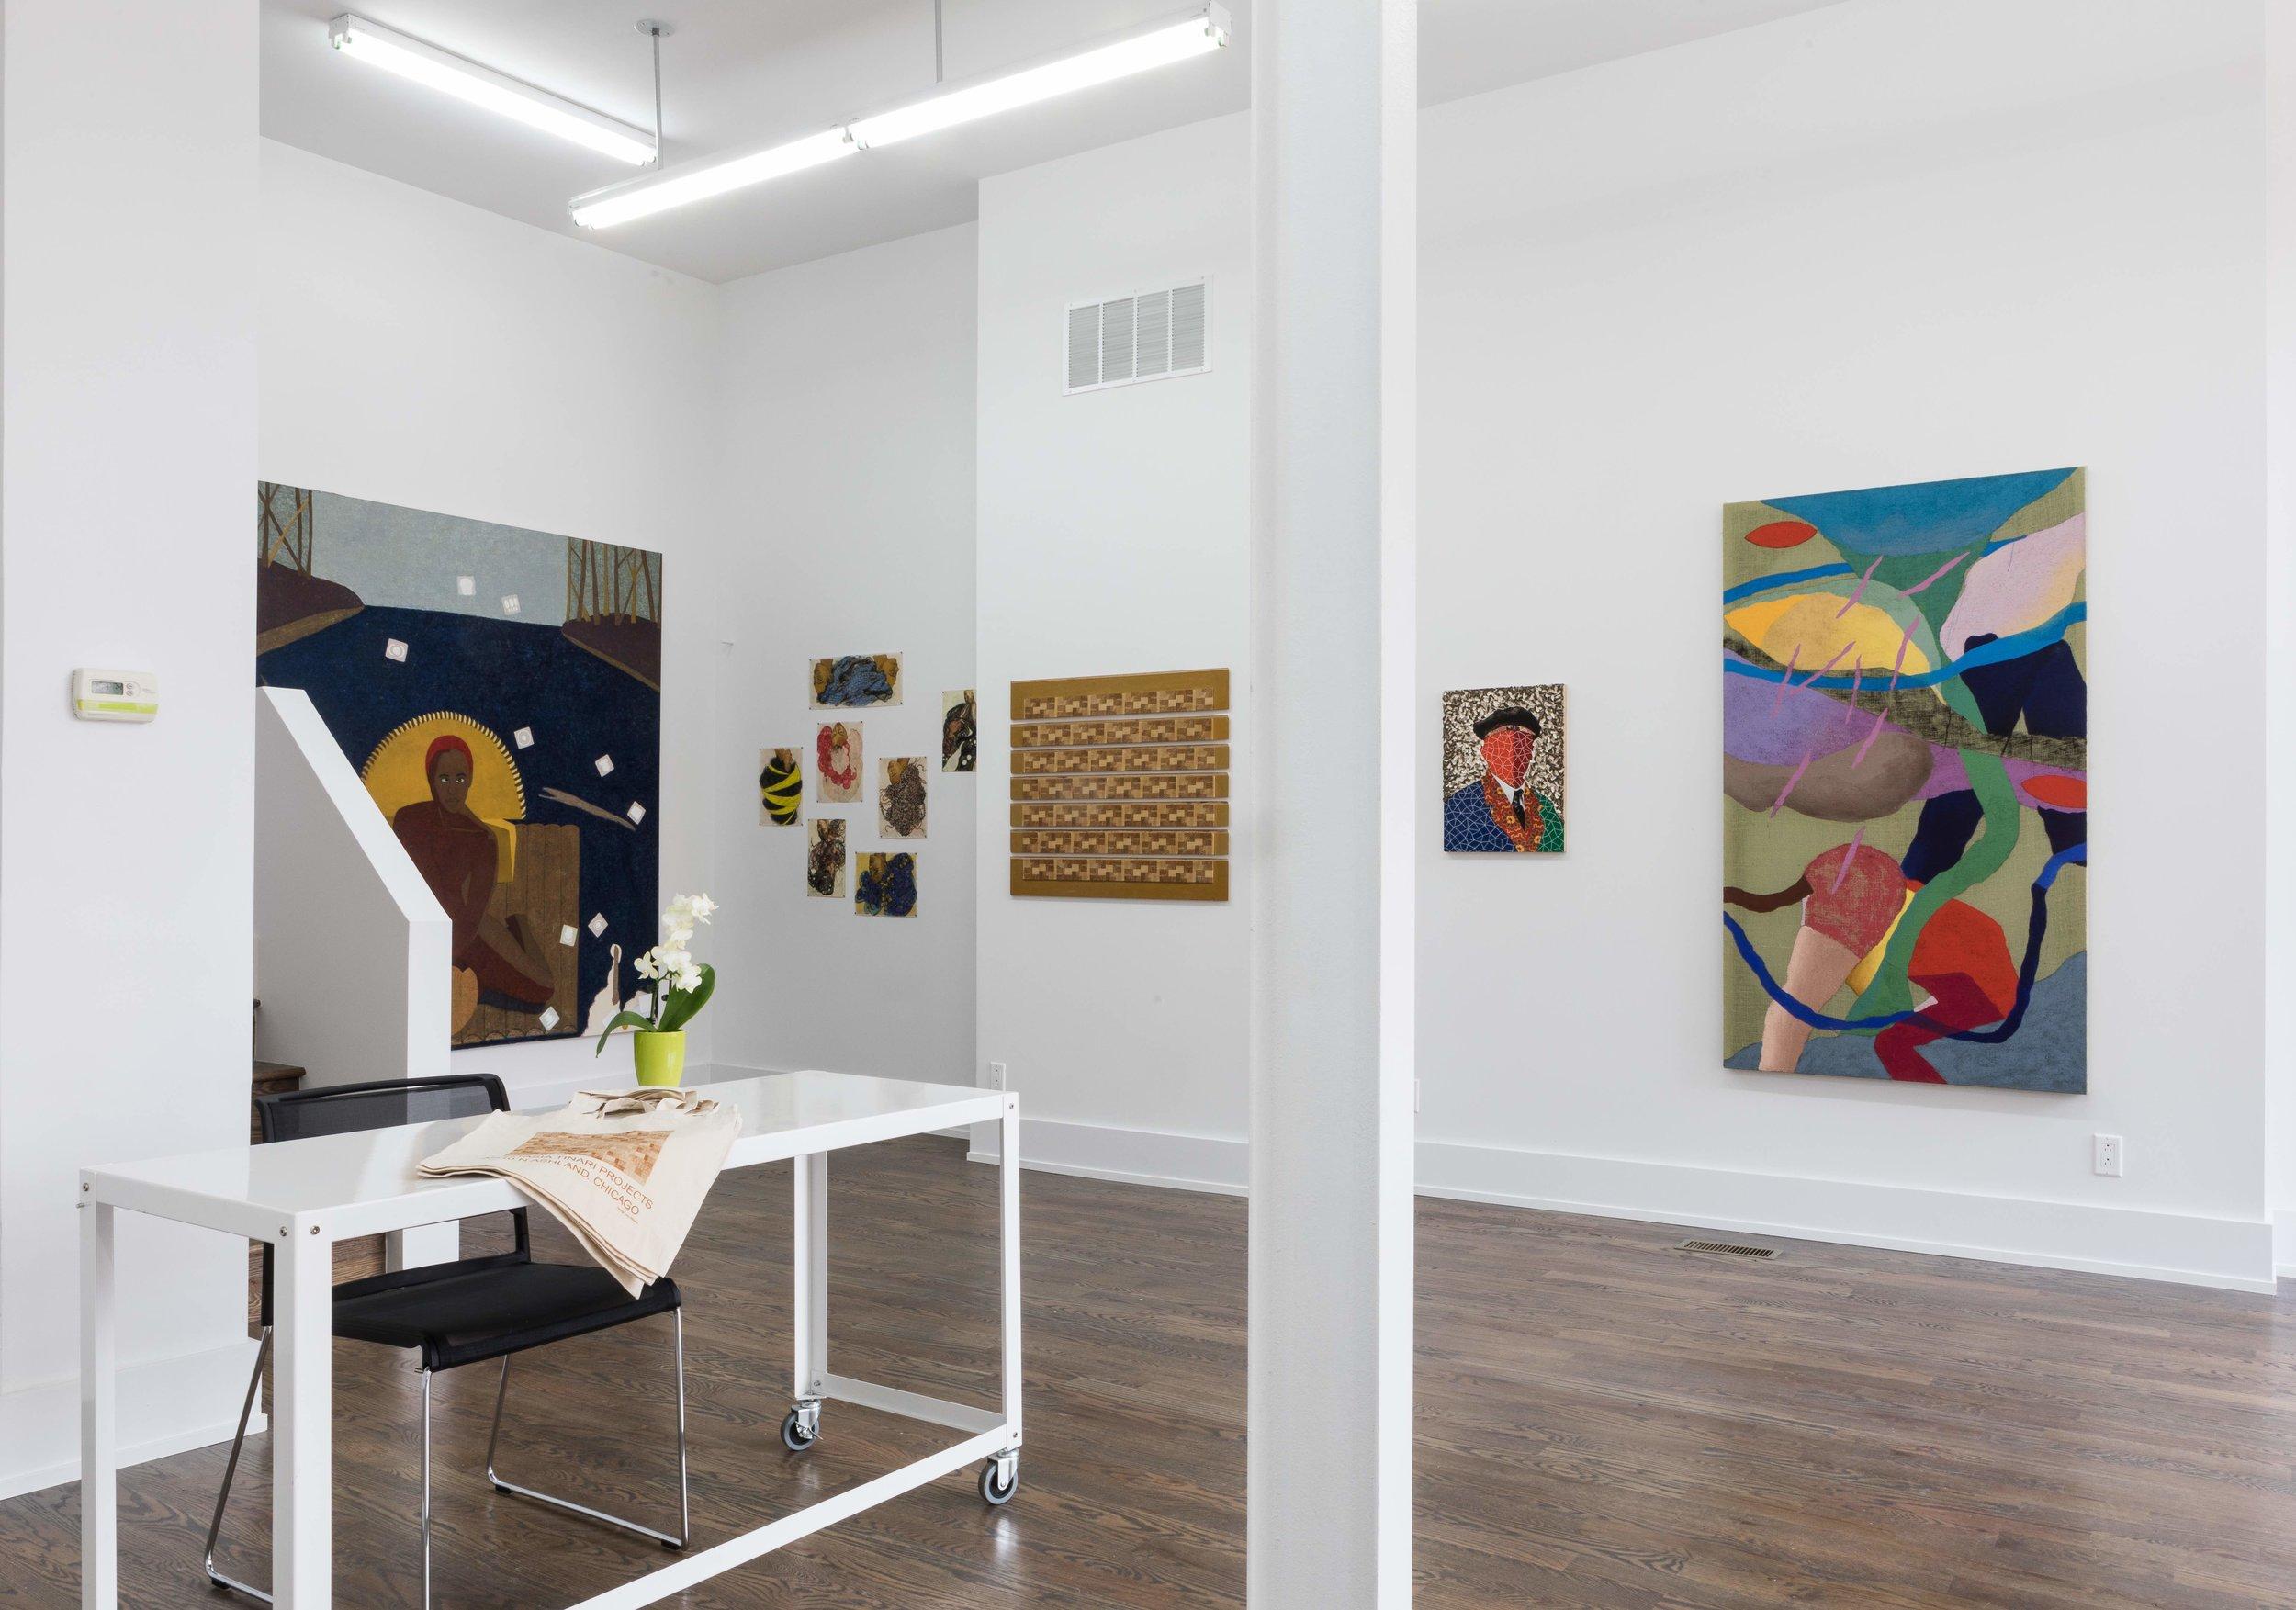 "Installation view: ""Automythography: Mequitta Ahuja, Kambui Olujimi, Kaveri Raina, Ato Ribeiro, Alex Yudzon,"" July 8 - August 30, 2017. Anastasia Tinari Projects, Chicago, IL.Photo: Michael Tropea."